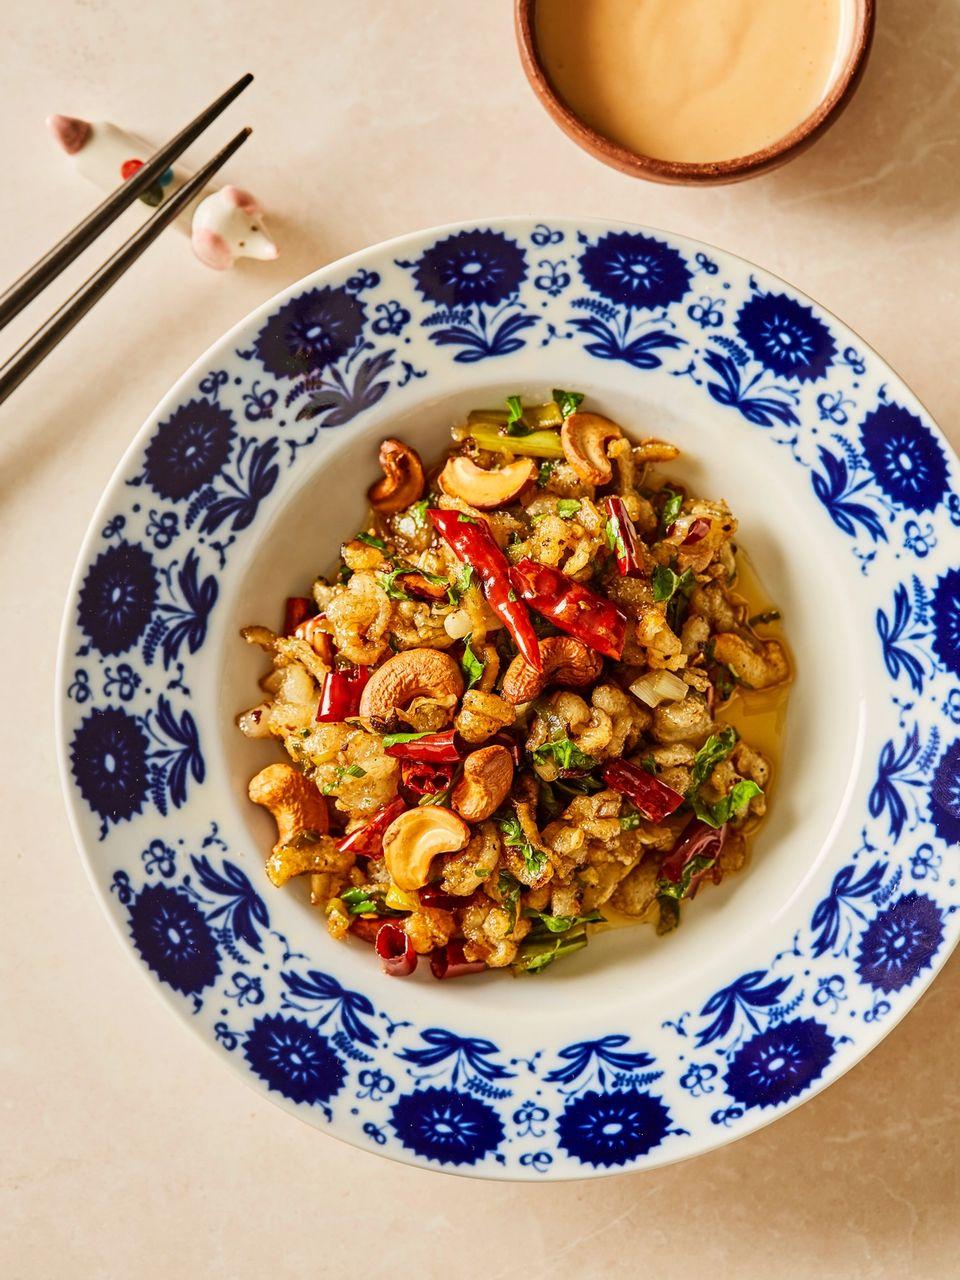 – Sichuan er mitt favorittkjøkken om dagen